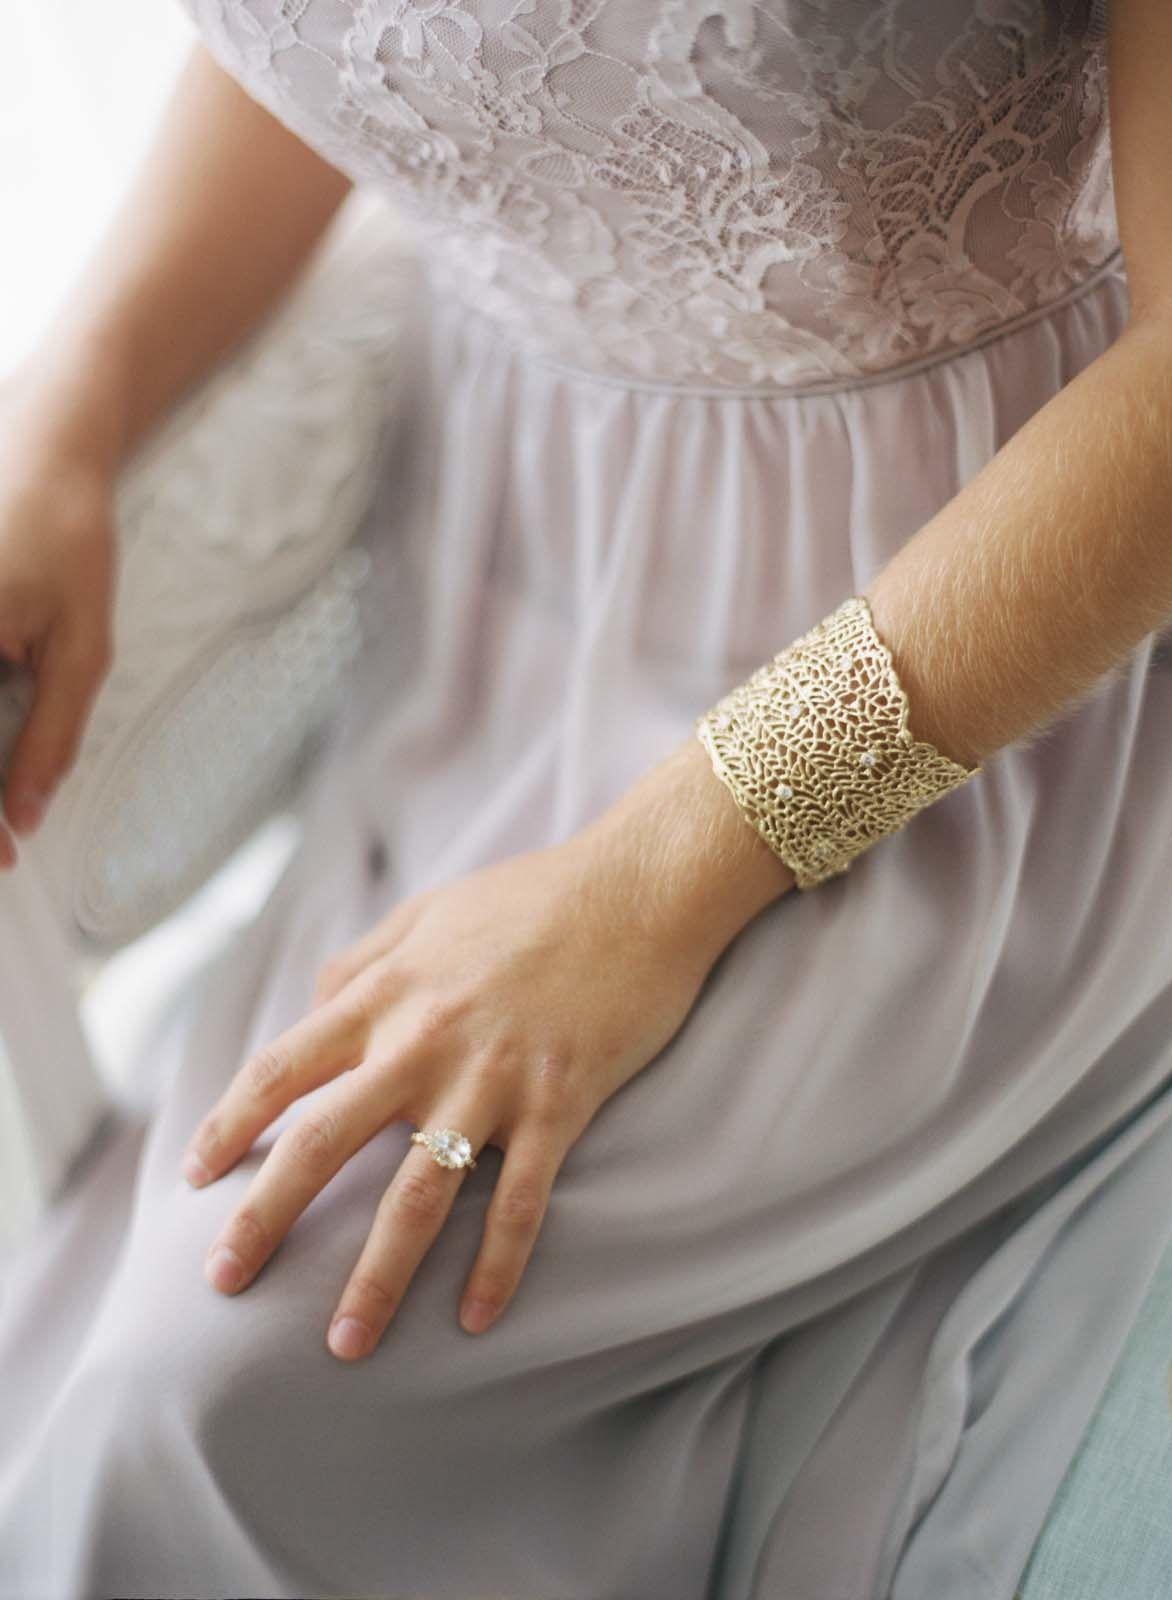 Gorgeous gold bracelet from Kira Kira - kirakira.com | Photography: Elisa Bricker - elisabricker.com  Read More: http://www.stylemepretty.com/2014/03/06/bridesmaids-tea-at-trump-winery/